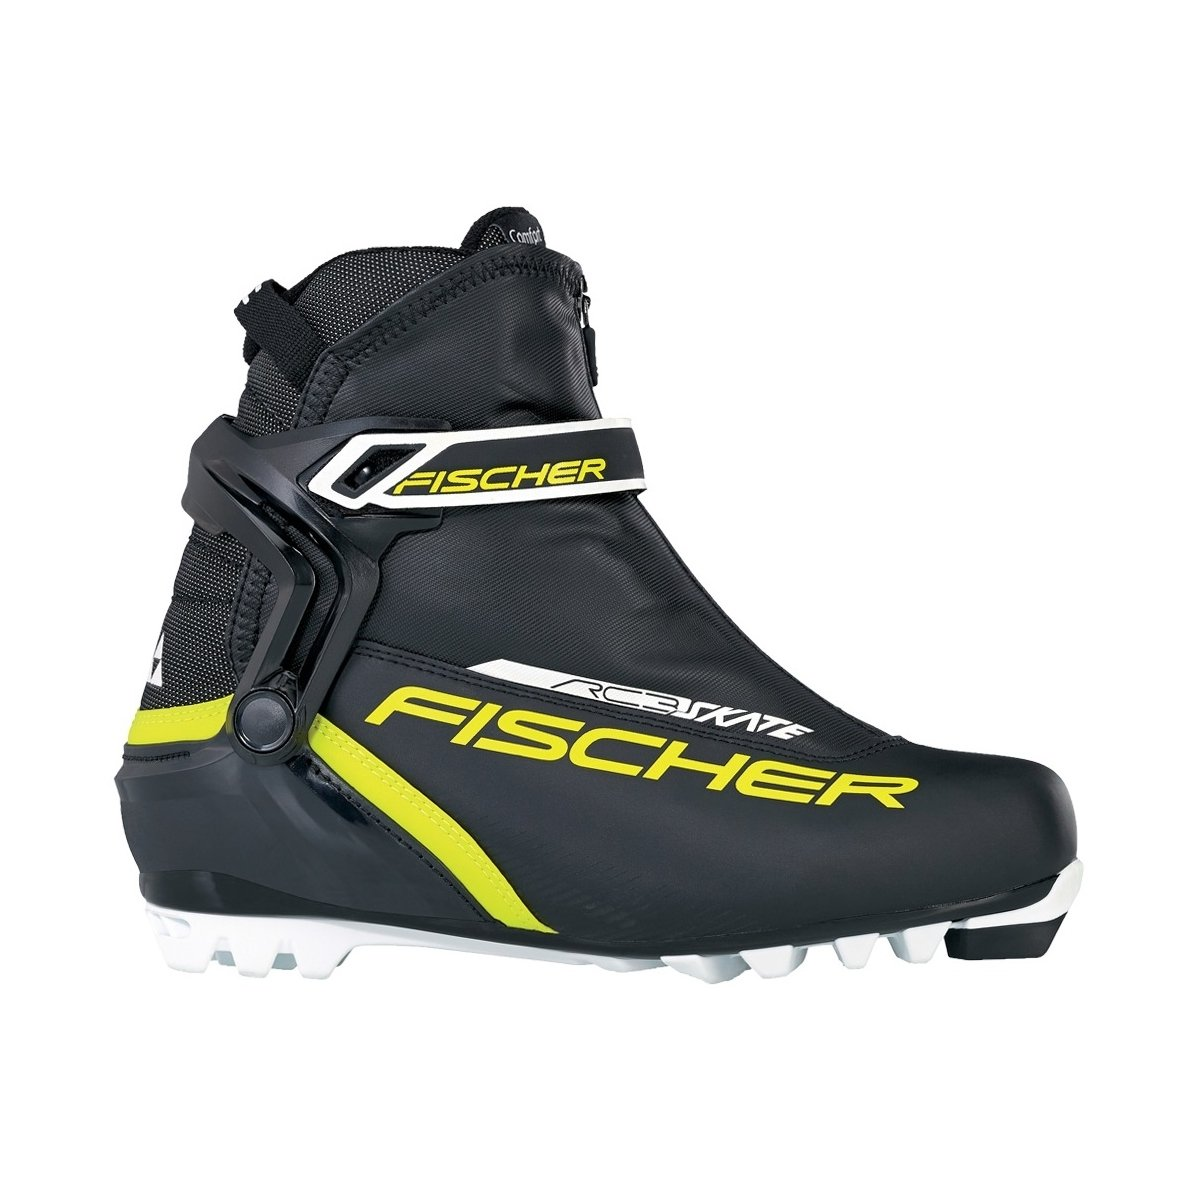 FISCHER RC3 RC3 RC3 Skate schwarz B0171R2LWY Stiefel Aktuelle Form 374780